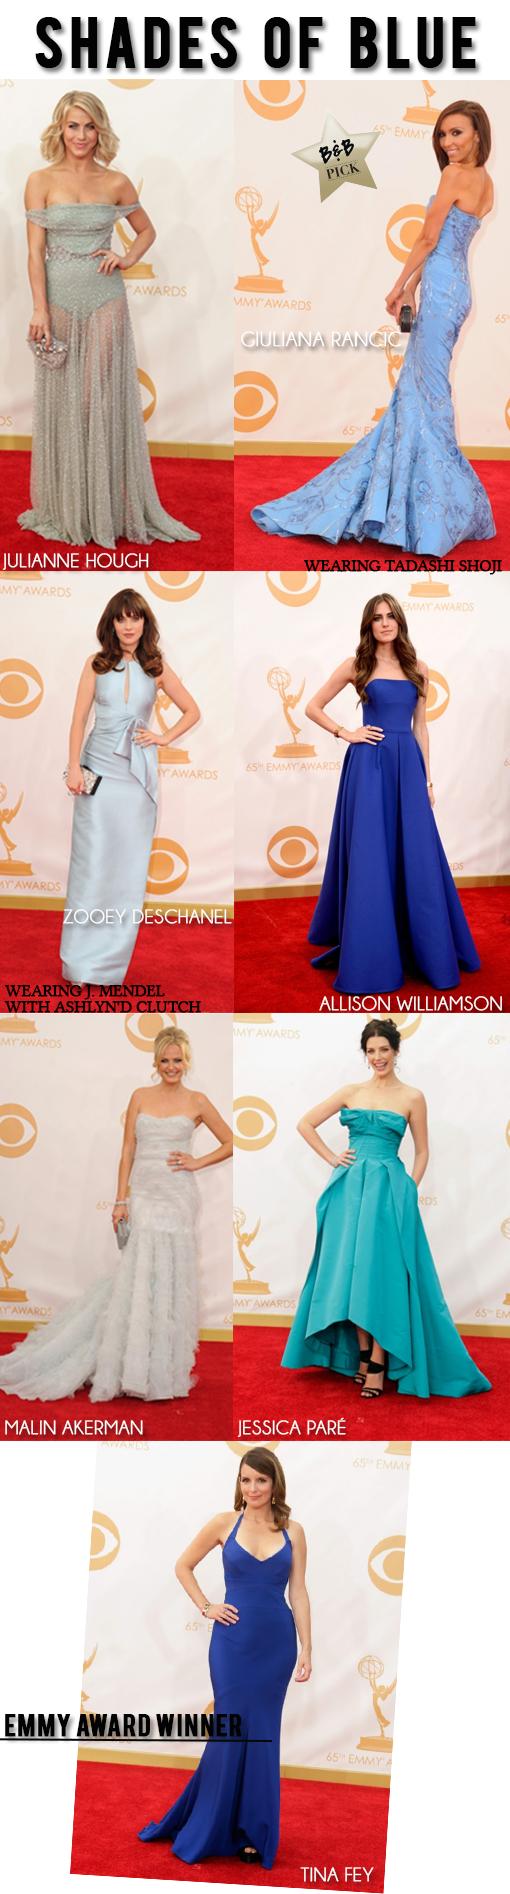 Emmys-1